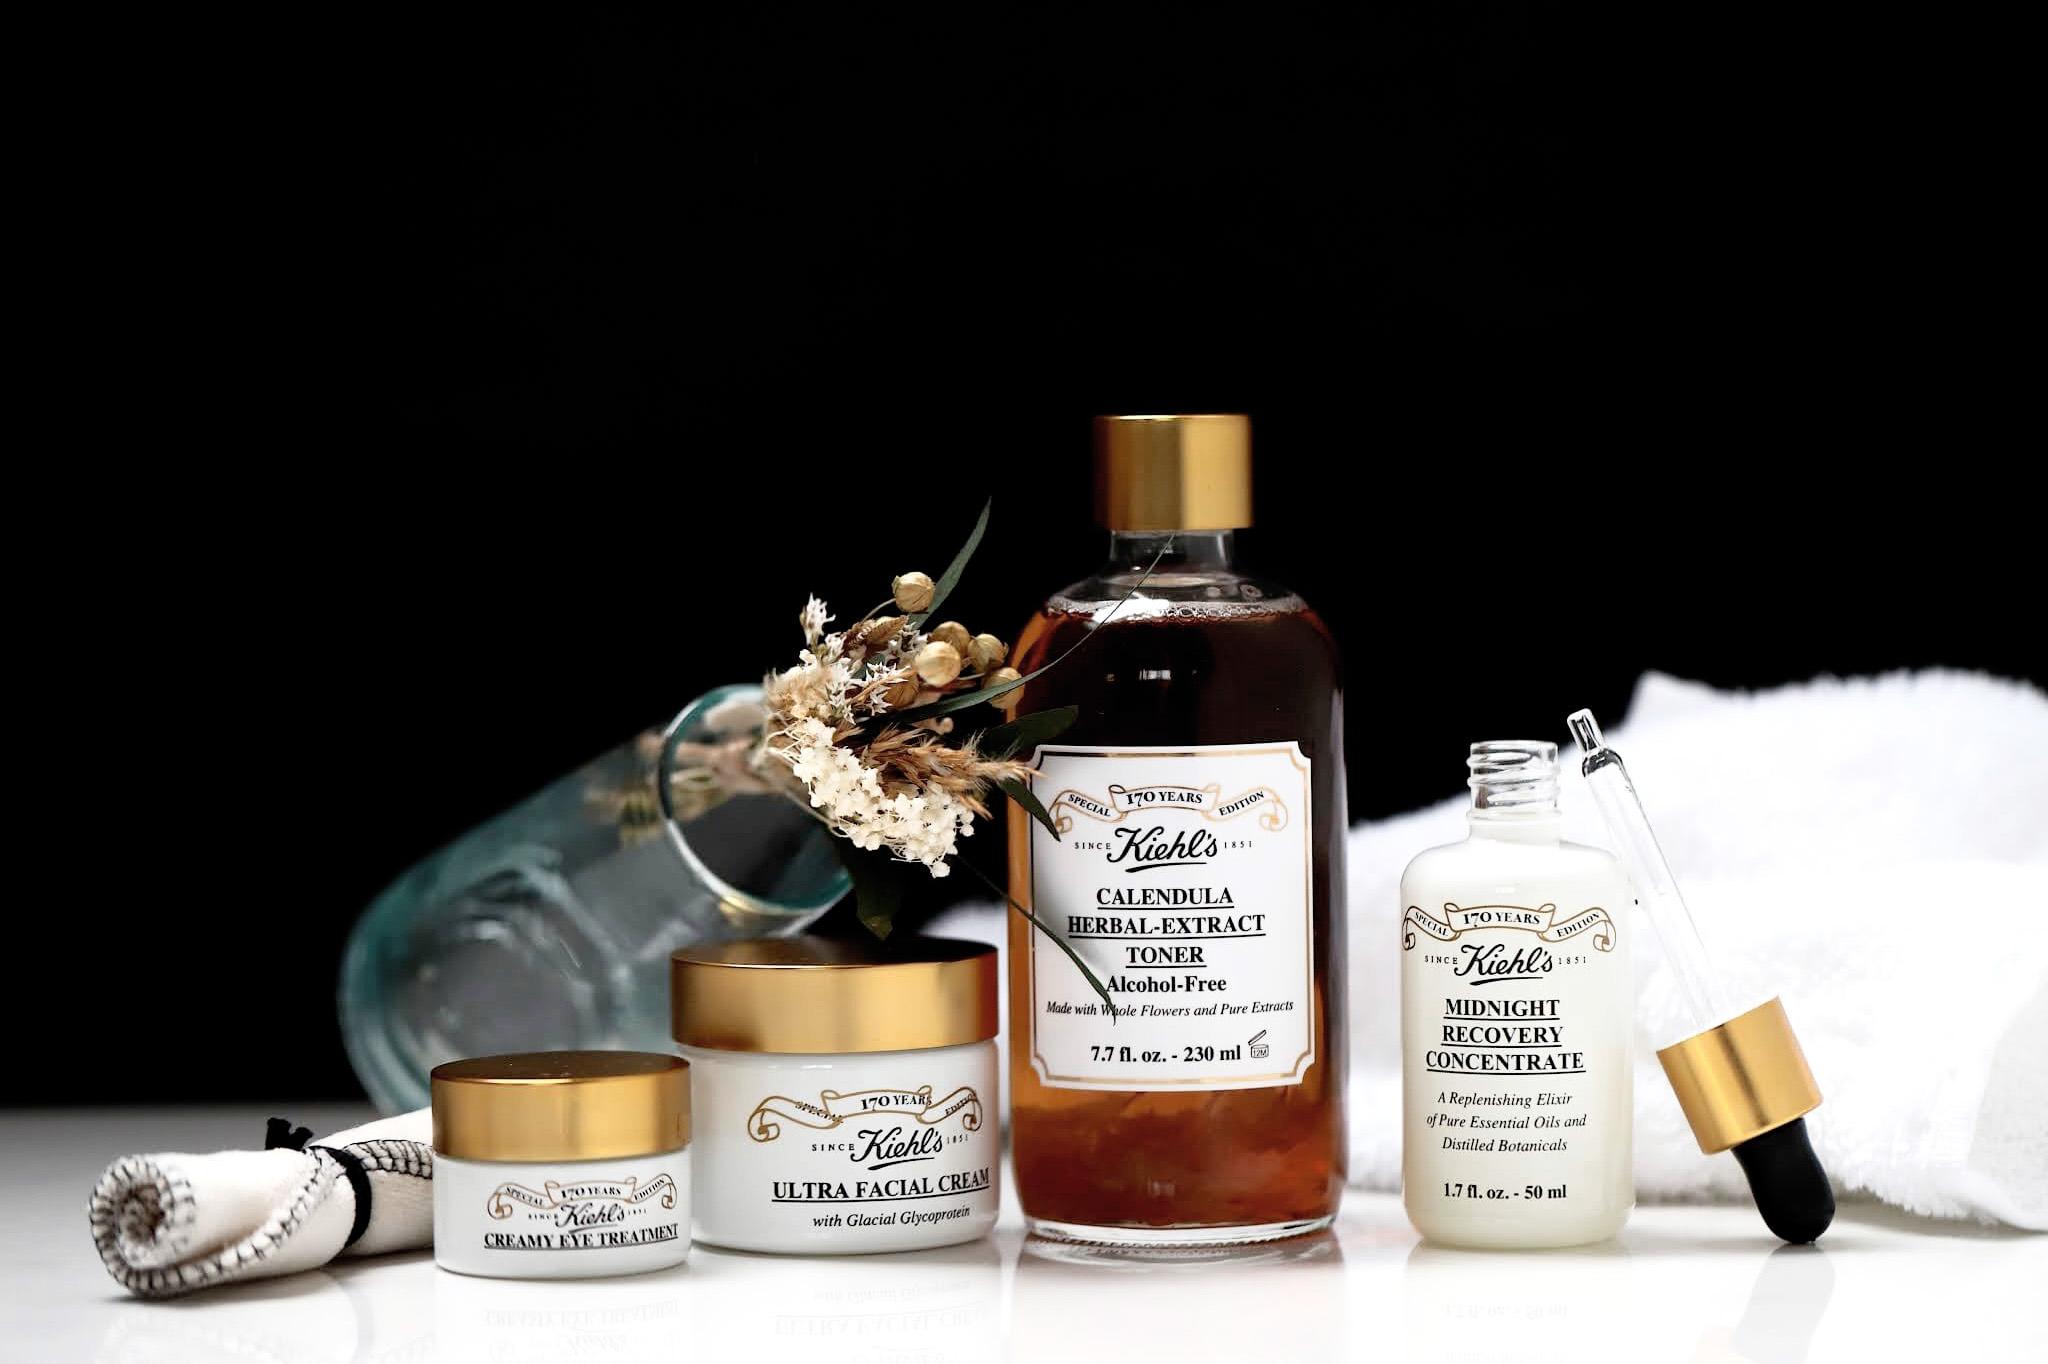 Kiehl's collection anniversaire 170 ans